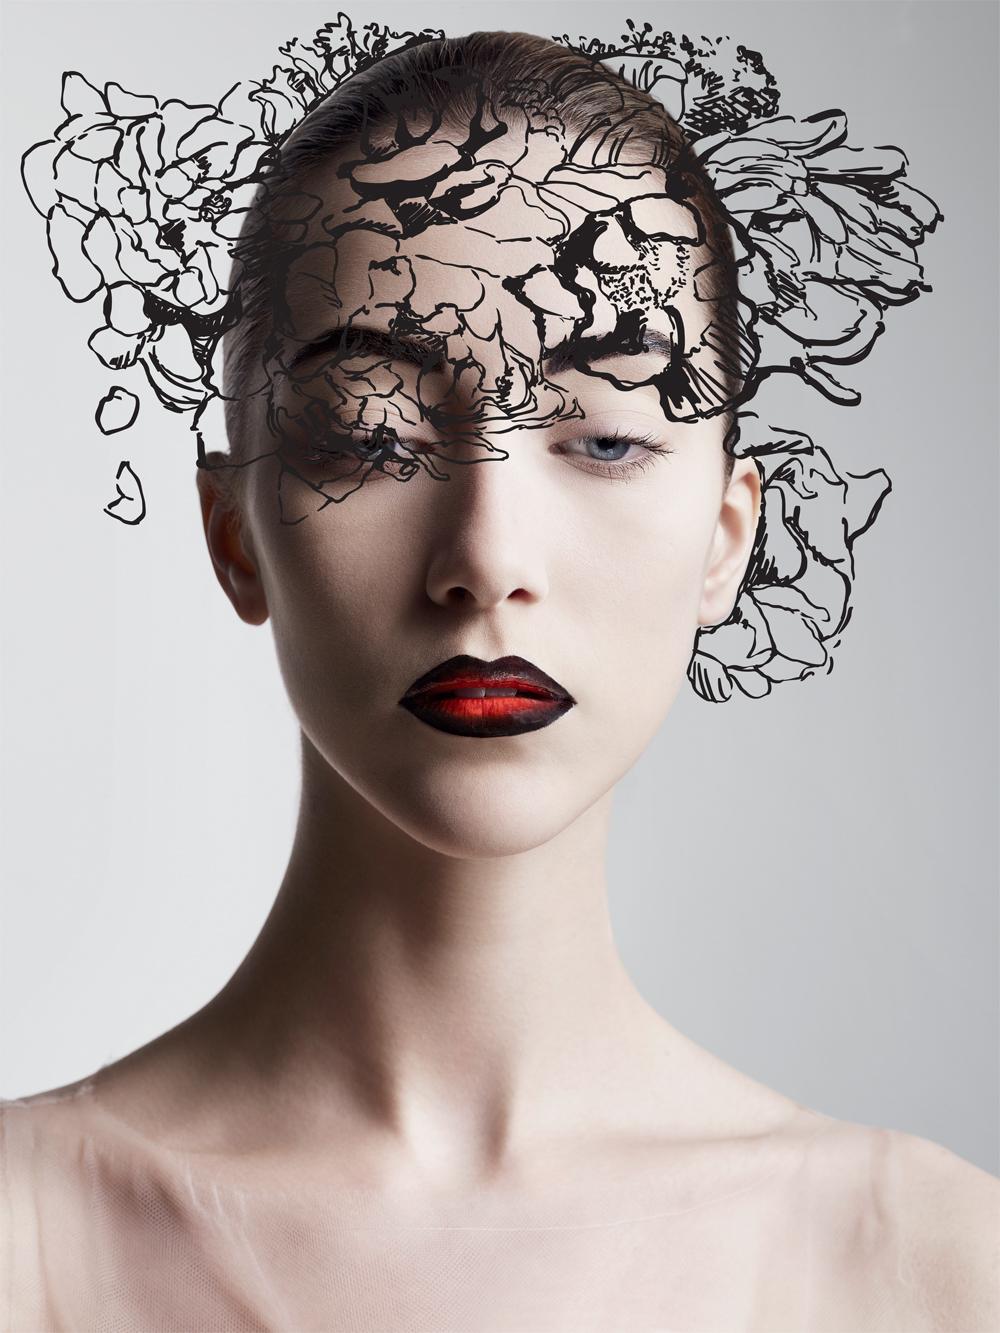 BENETTON-FABRICA-VFNO-2013-Fotografia-Vogue-Portugal-Ilustra%C3%A7%C3%A3o-Fabrica-by-Mariana-Fernandes.jpg